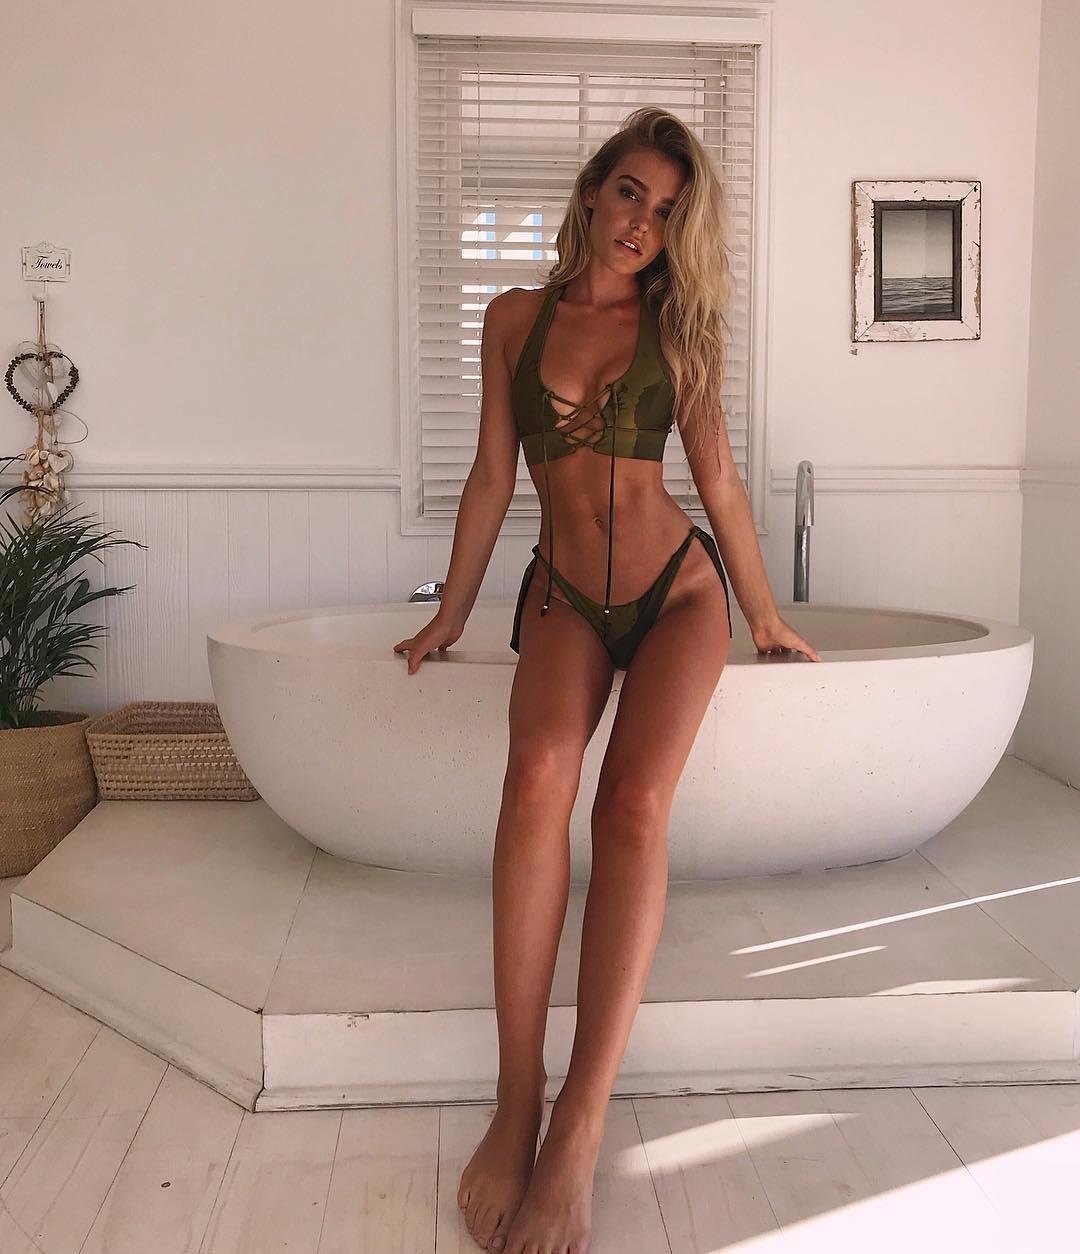 Pussy Georgia Gibbs nudes (77 pictures) Sideboobs, YouTube, braless